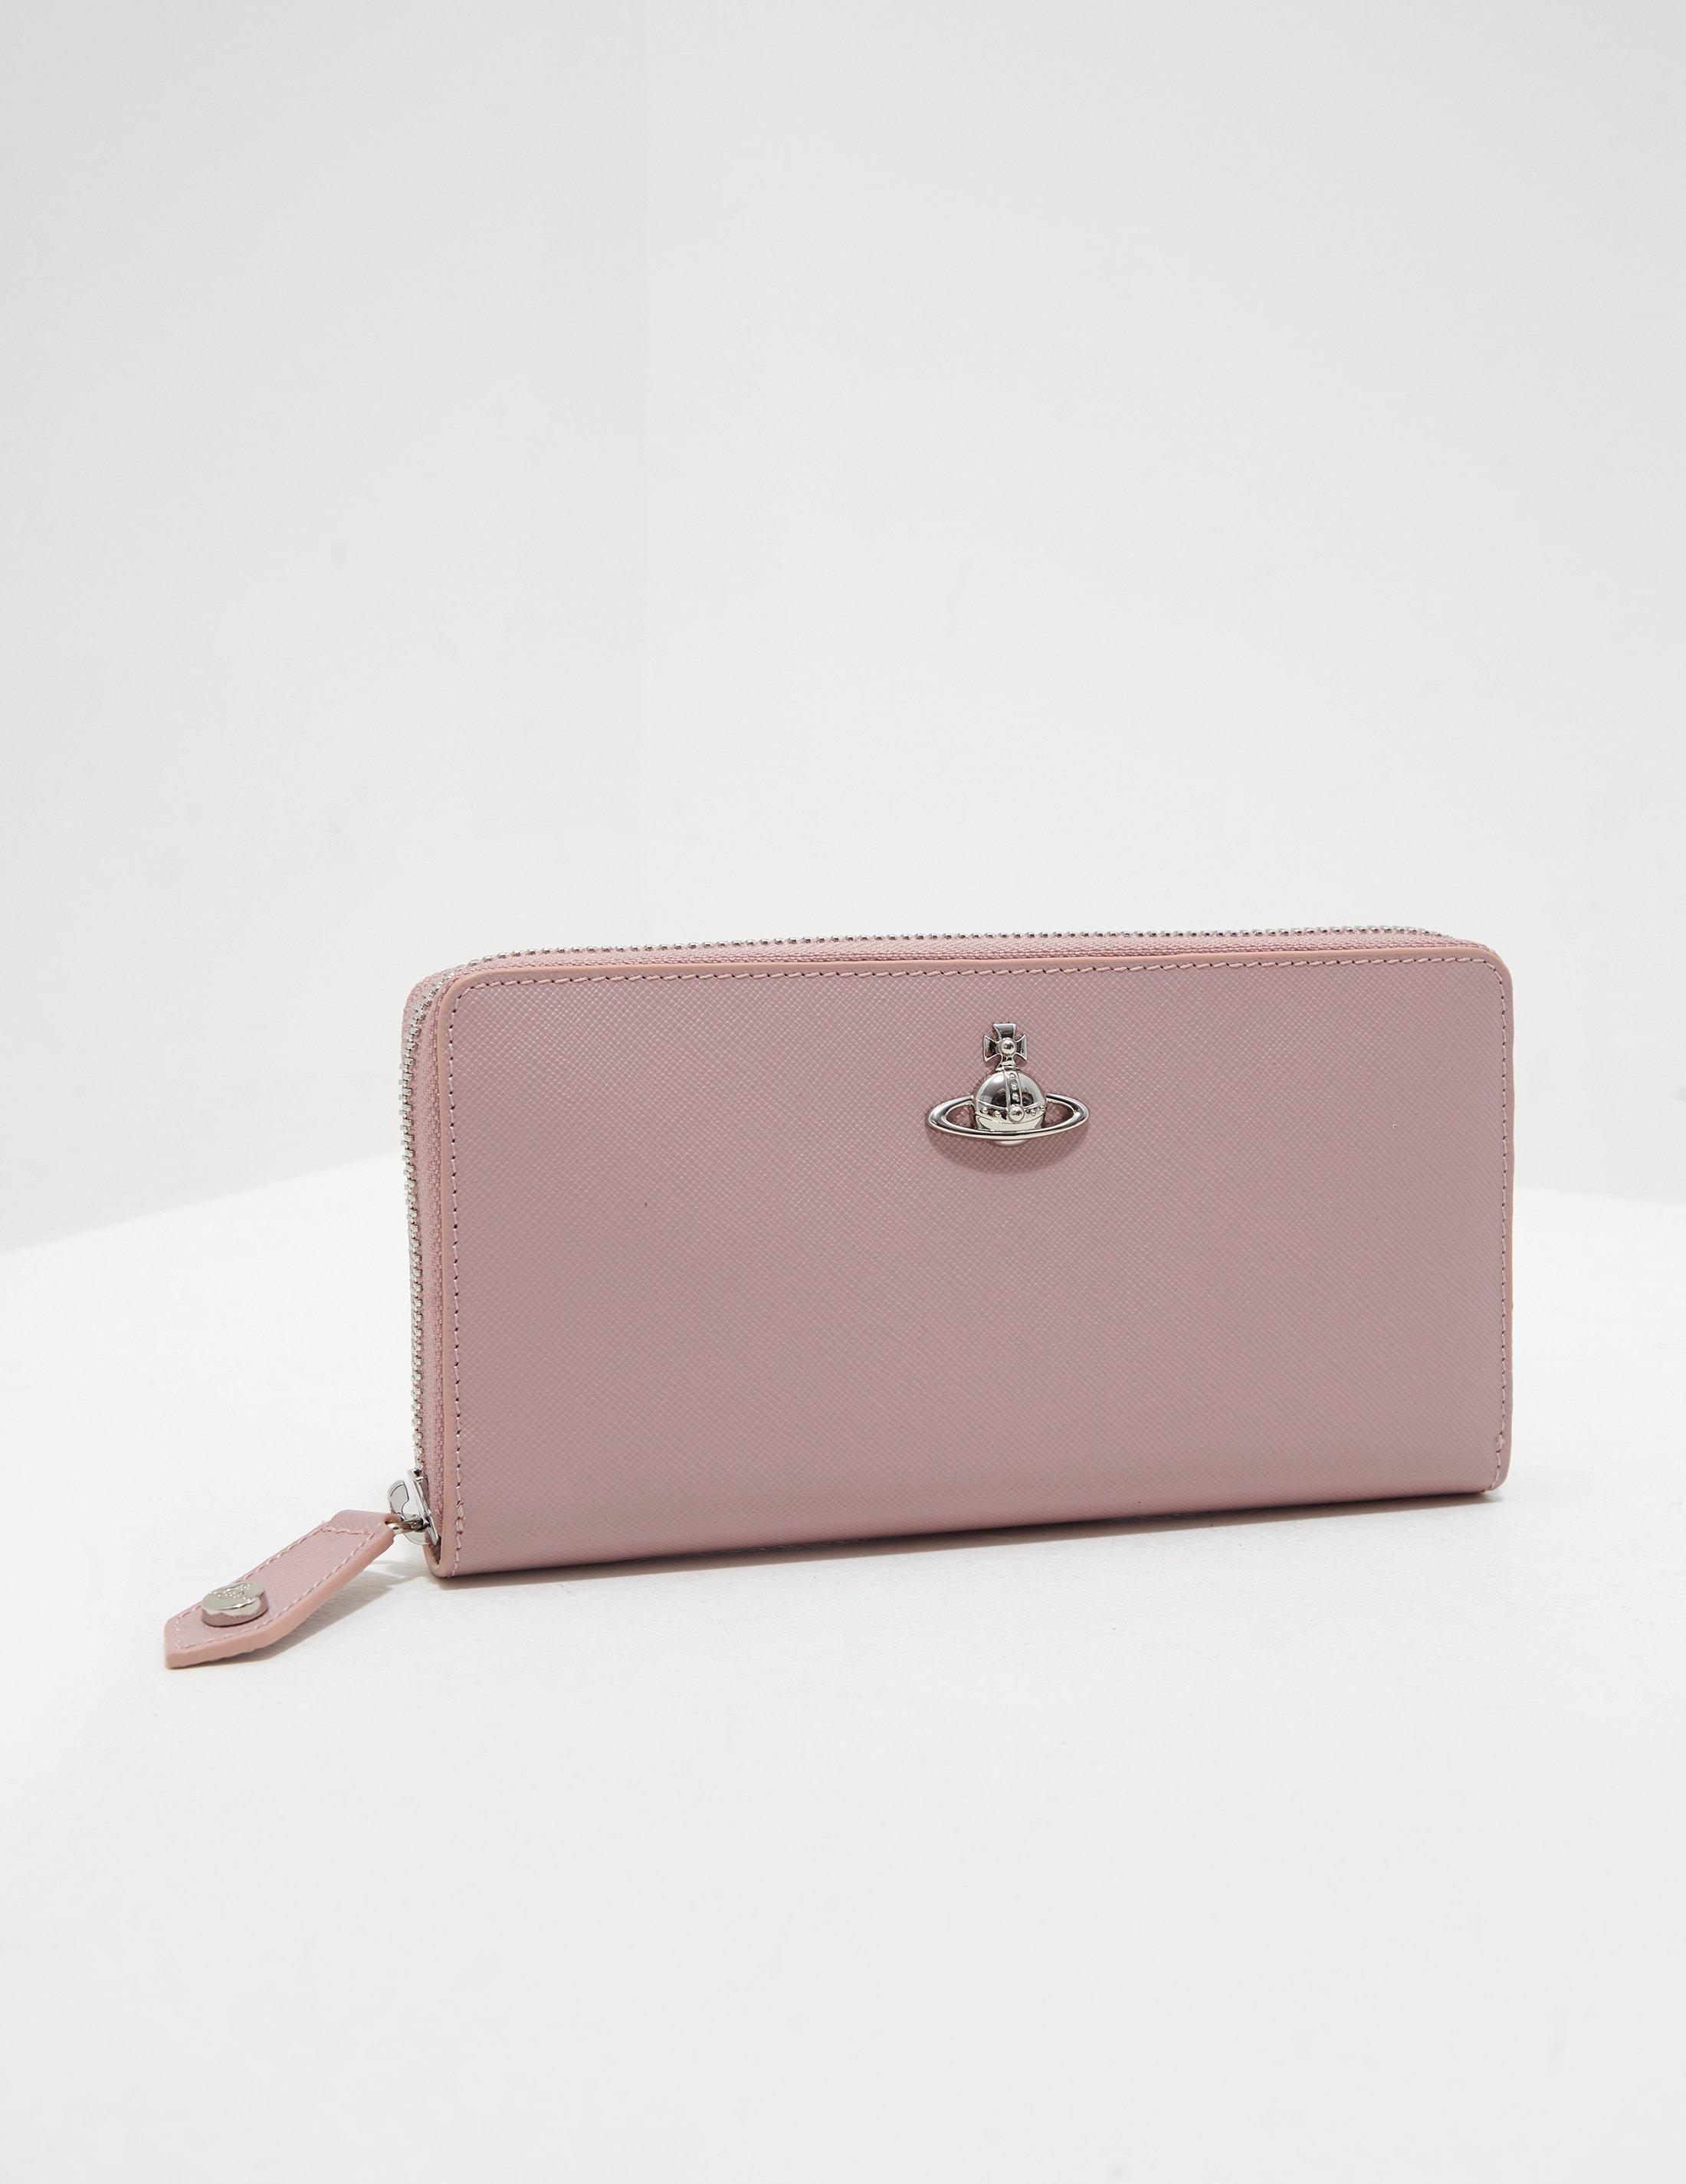 96ea5f7ce2327 Vivienne Westwood Womens Pimlico Zip Purse Pink in Pink - Lyst